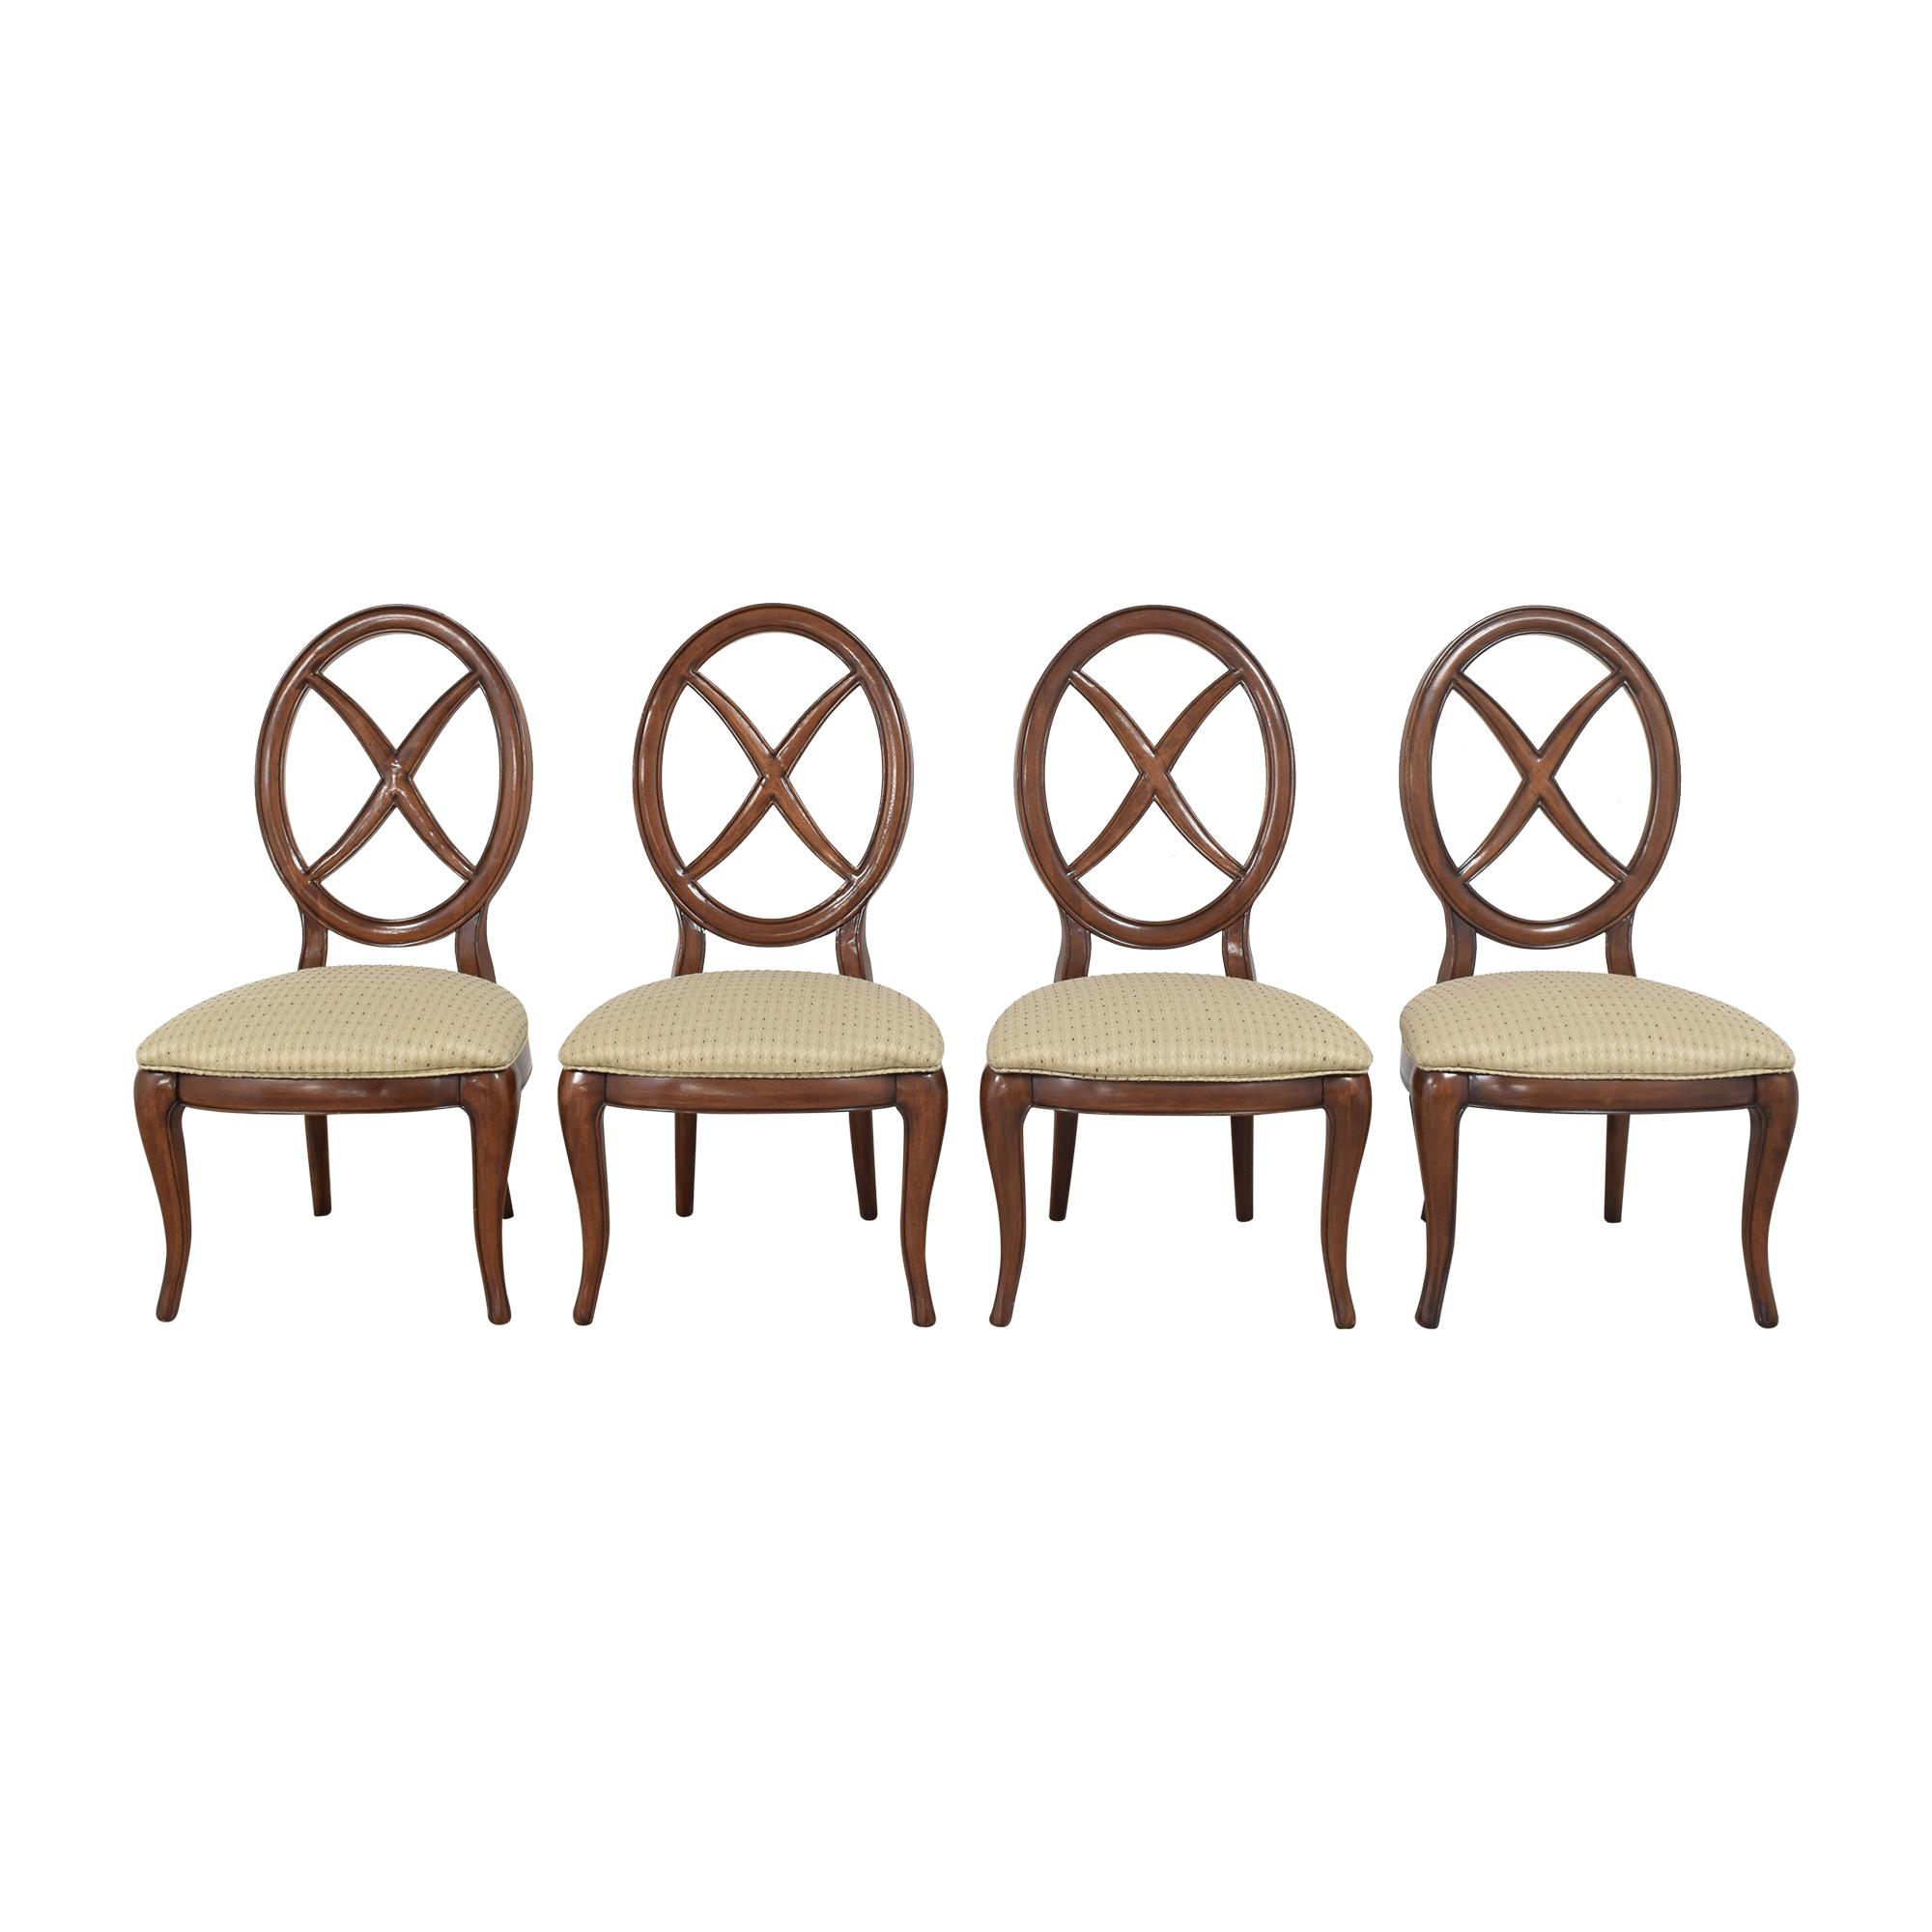 Thomasville Thomasville Bogart Dining Chairs Chairs